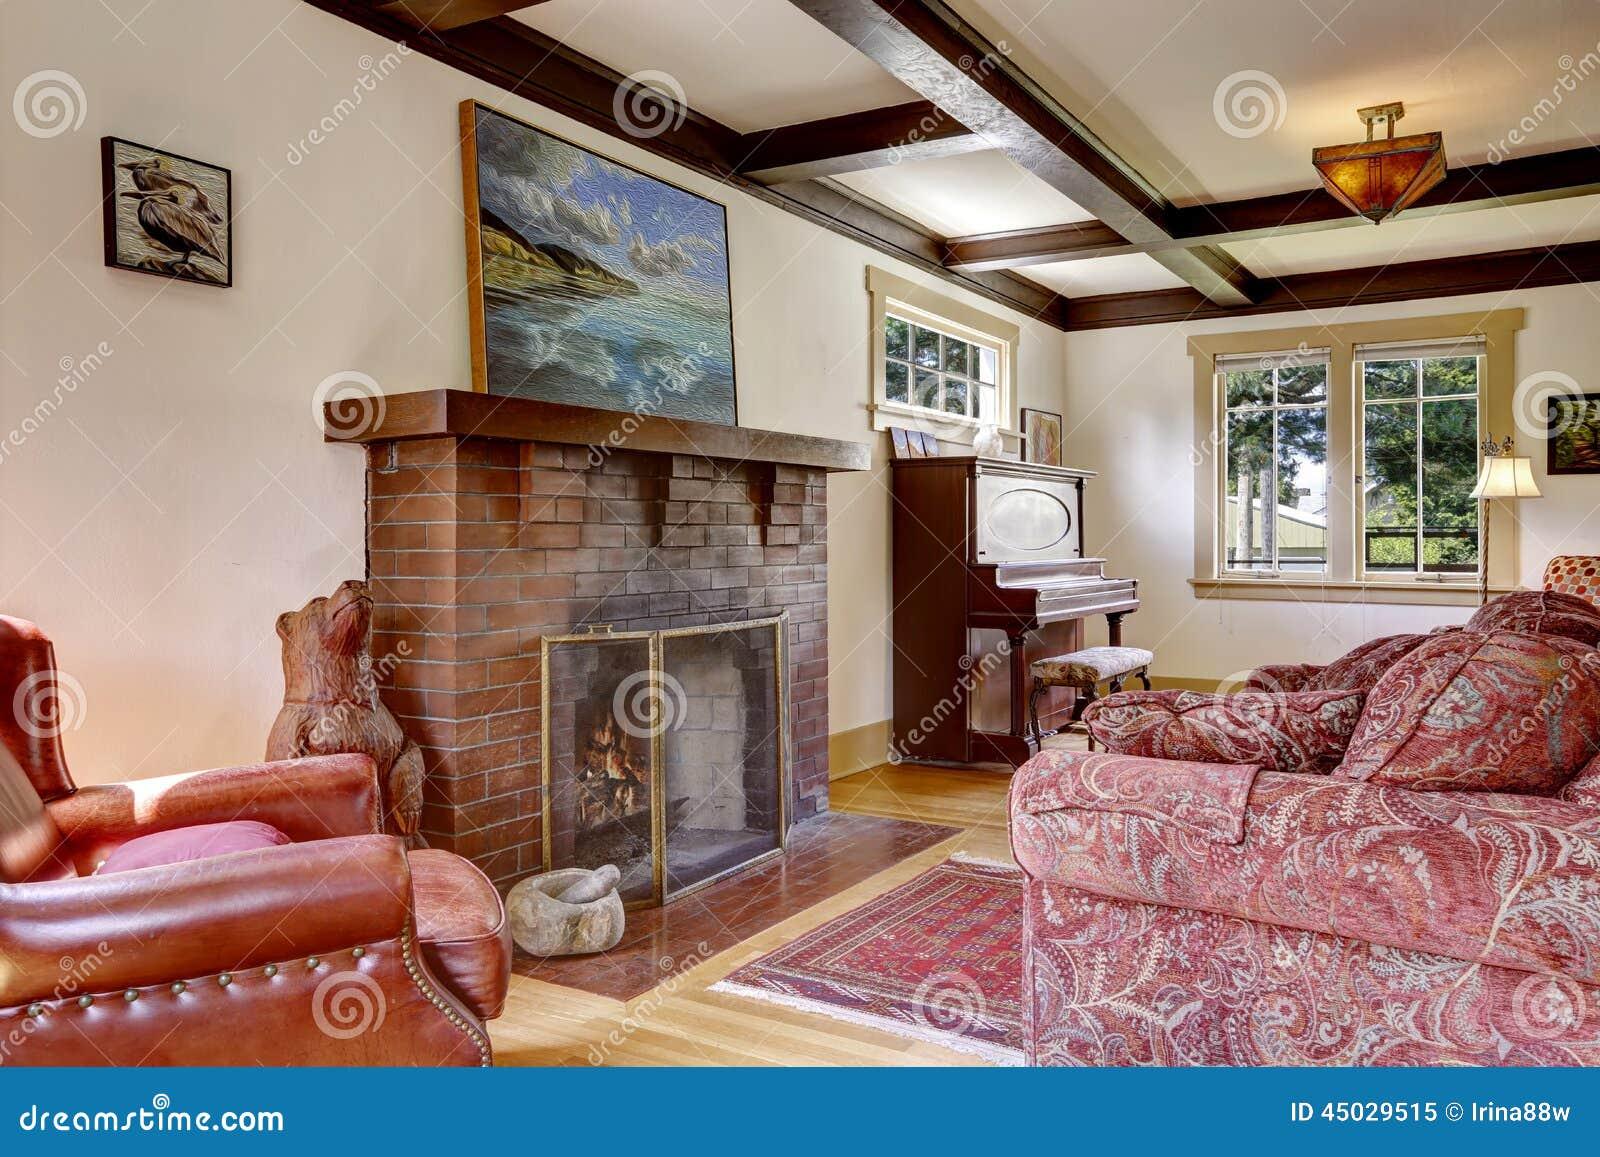 Sala de estar con muebles antiguos y la chimenea imagen de - La chimenea muebles ...